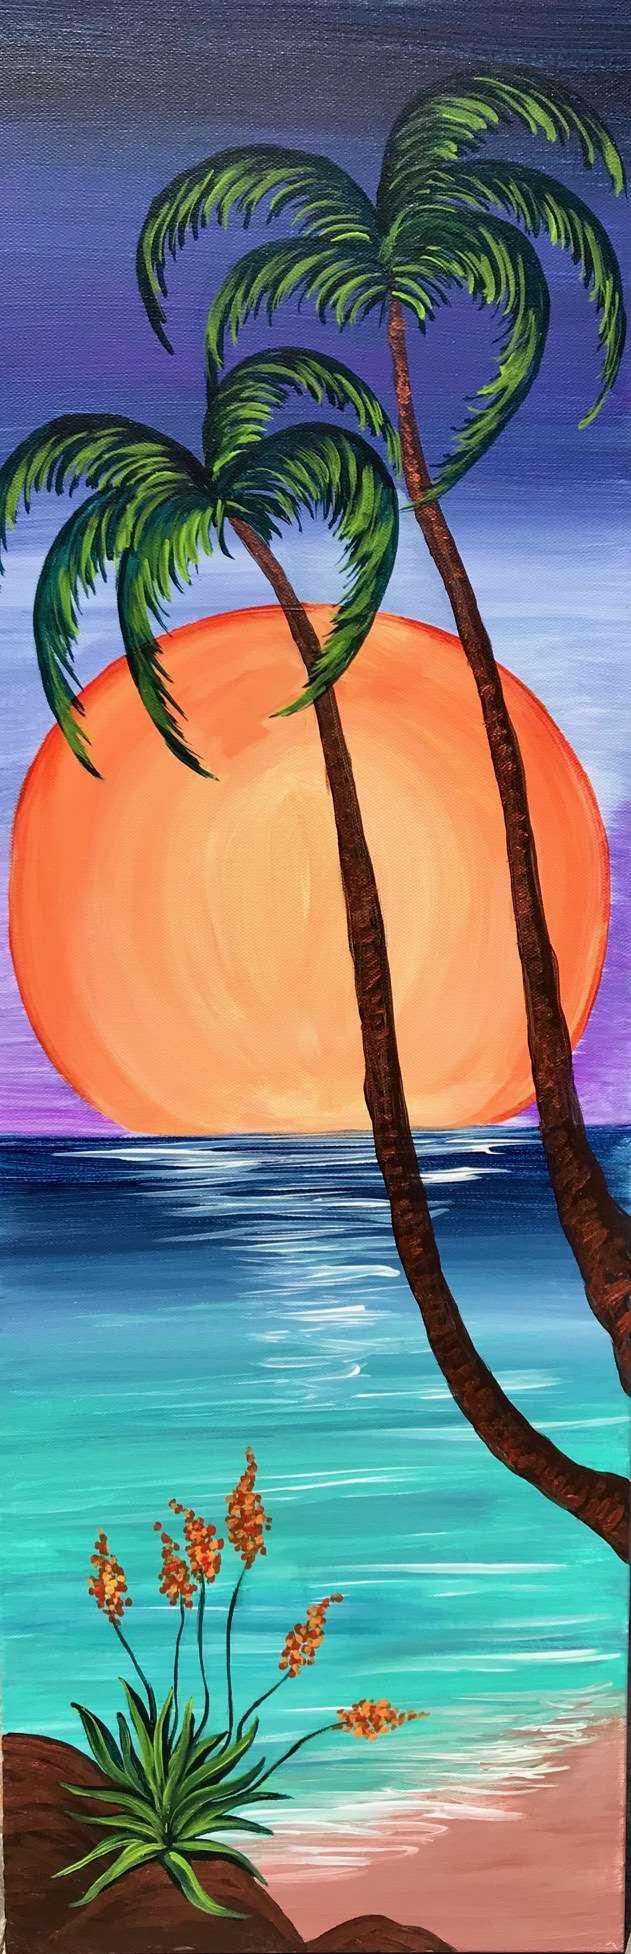 10 x 30 Canvas!  Radiant Tropical Moon